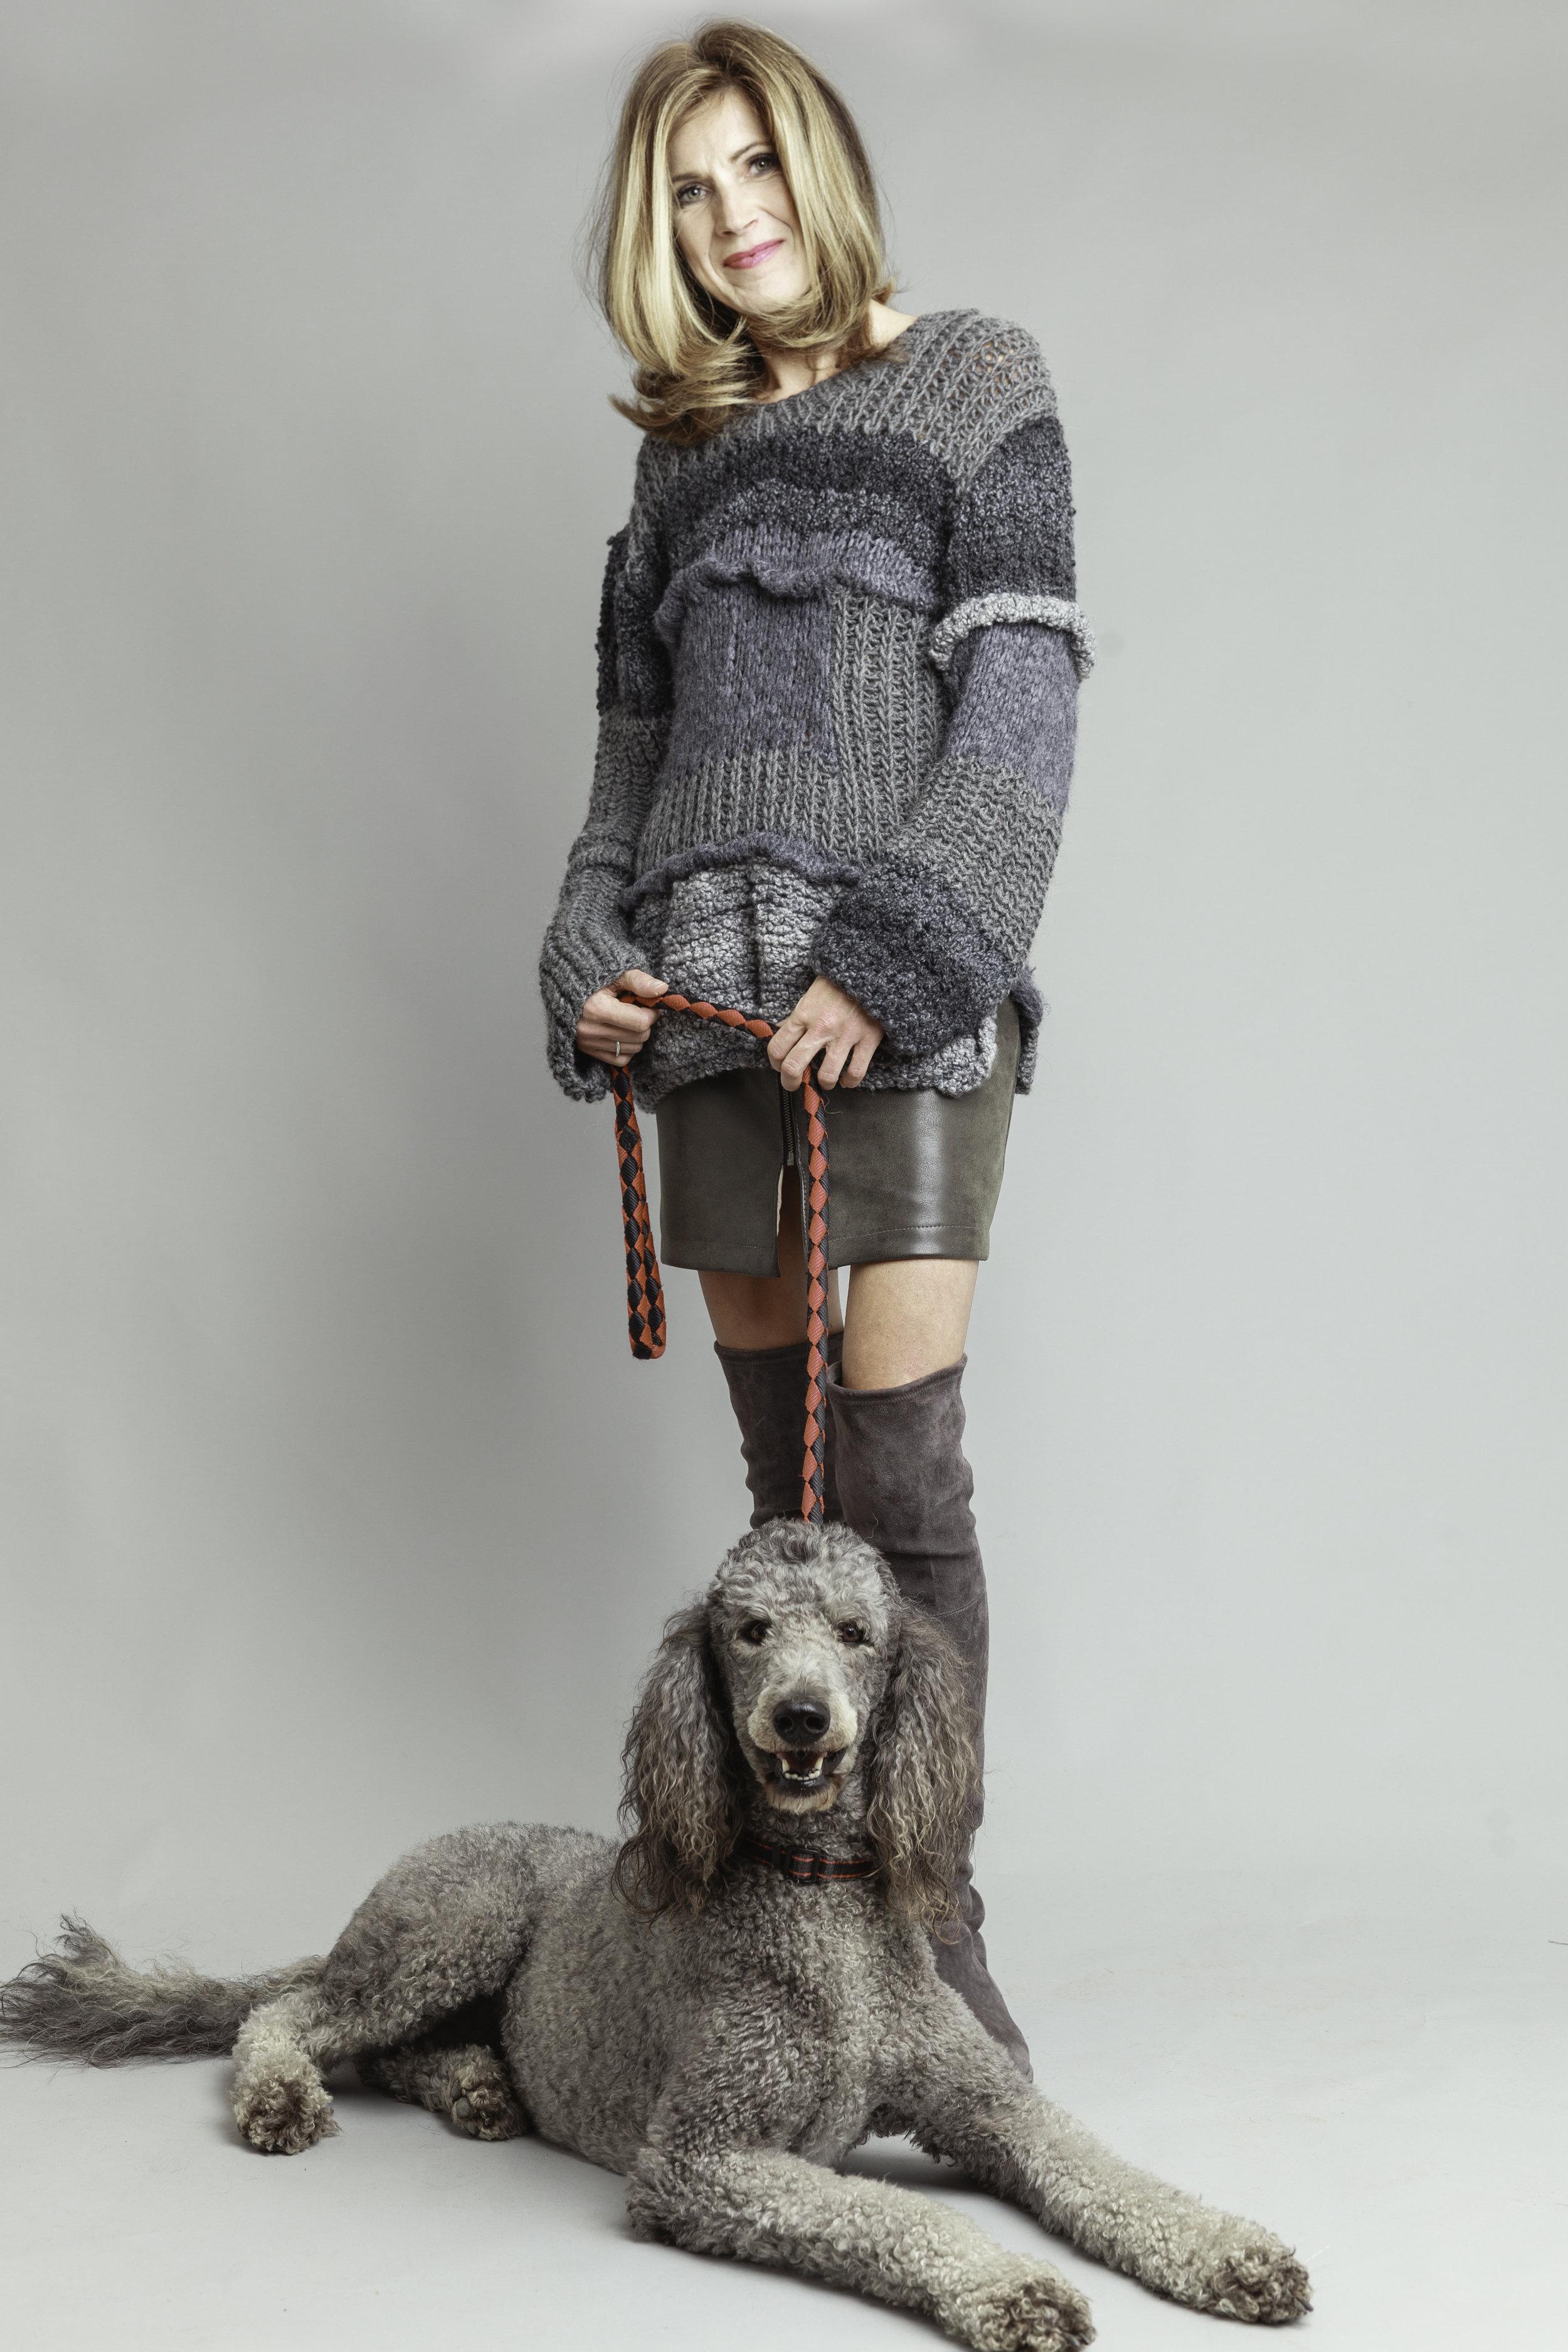 Gunda Hafner: Uncompromising Eco-Conscious Fashion for the Modern-Day Woman #Savant - Image:Inna Kostukovsky